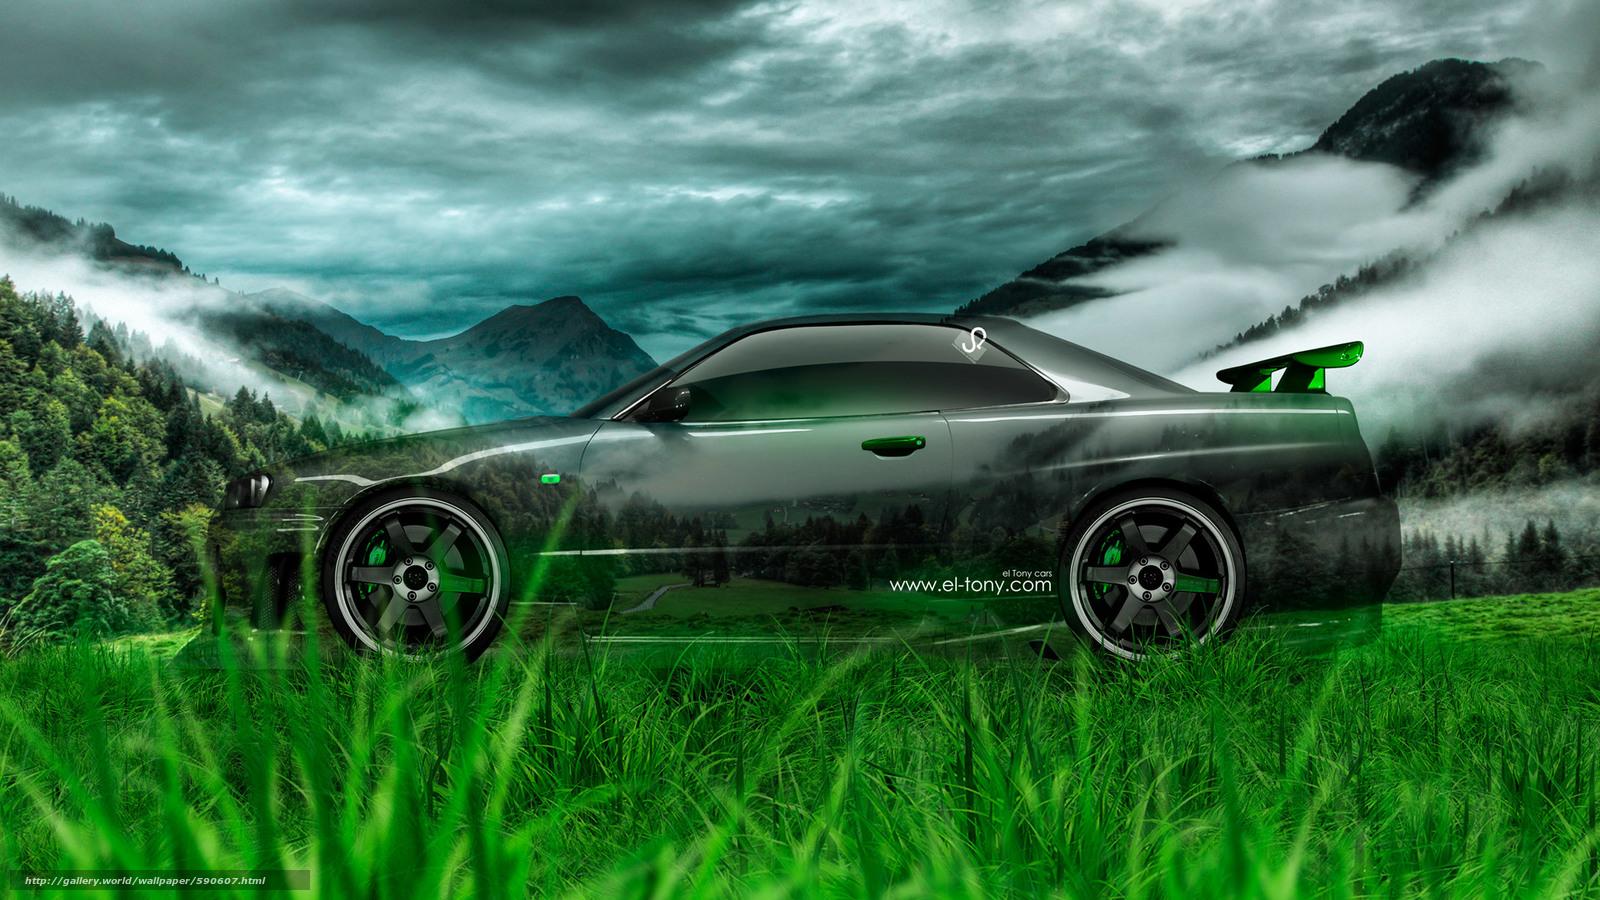 Merveilleux Tony Kokhan, Nissan, Skyline, GTR, R34, Side, Crystal, Car, Nature, Green,  Grass, El Tony Cars, Photoshop, HD Wallpapers, Tony Cohan, Photoshop,  Style, ...